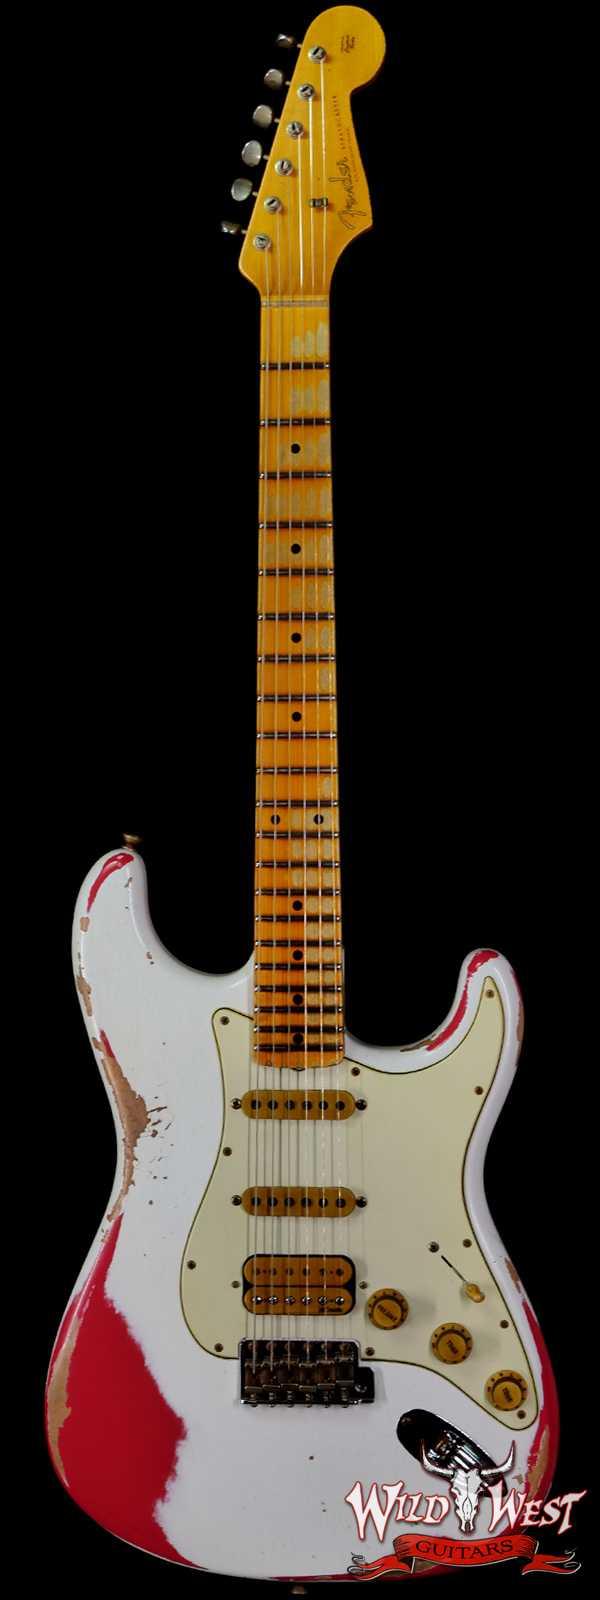 Fender Custom Shop Wild West White Lightning 2.0 Stratocaster HSS Maple Board 21 Frets Heavy Relic Fiesta Red